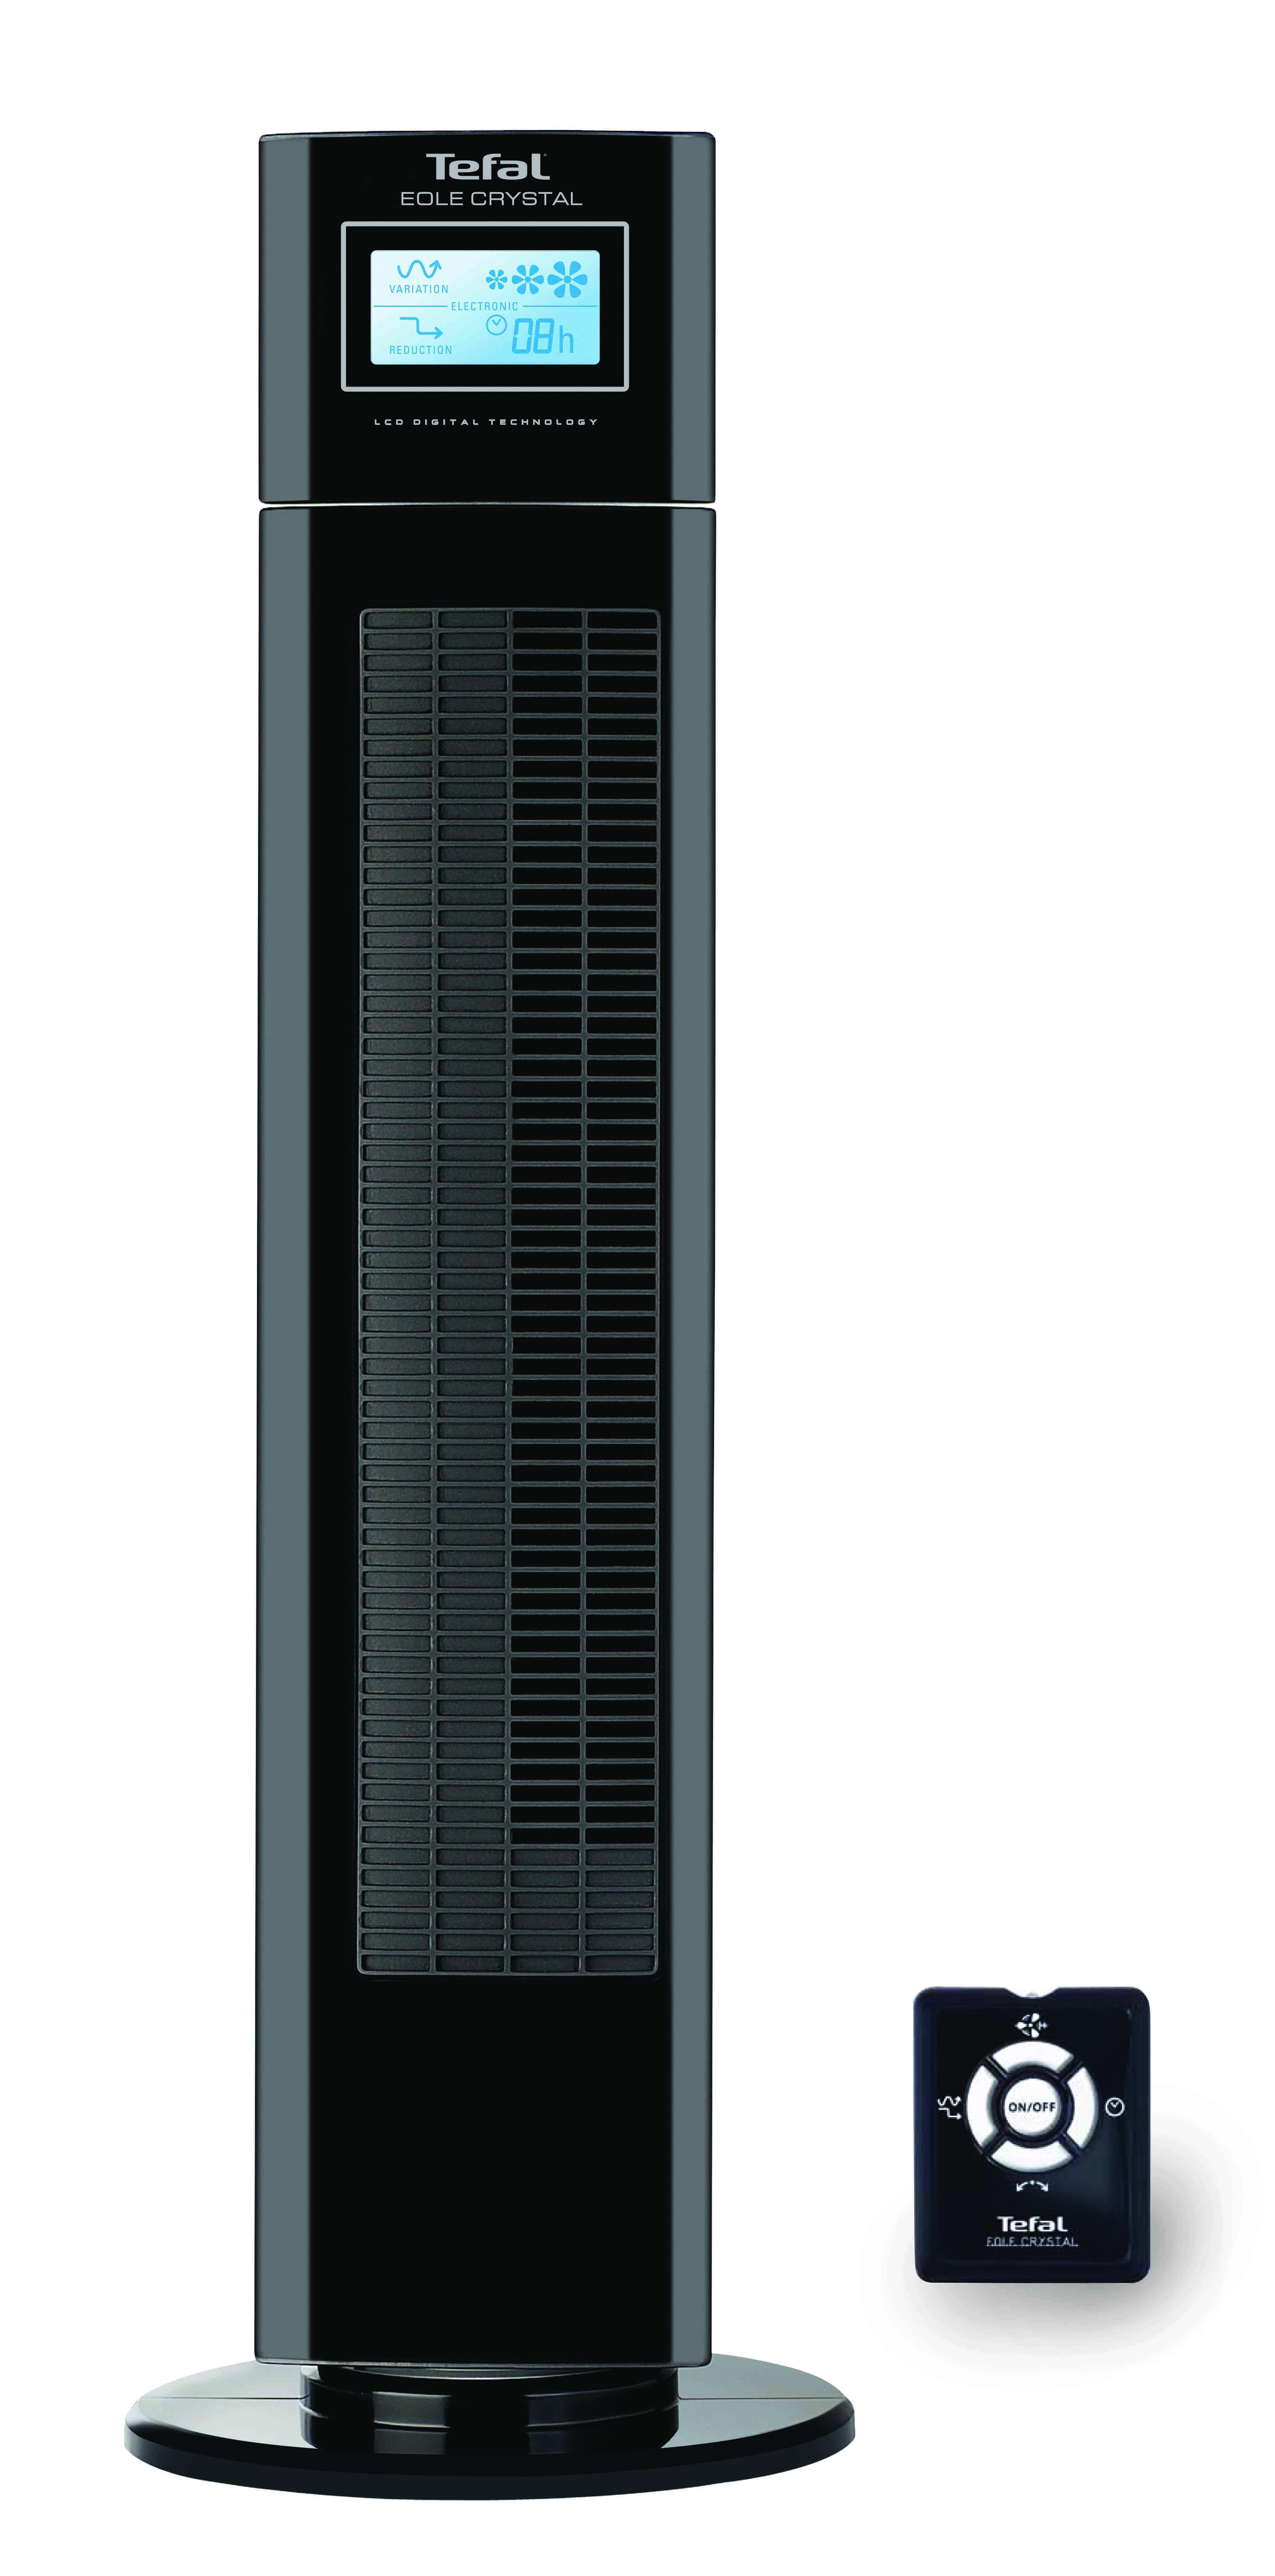 TEFAL พัดลมทาวเวอร์ จอ LCD แสดงผล ปรับความเร็ว 3 ระดับ รุ่น VU6555